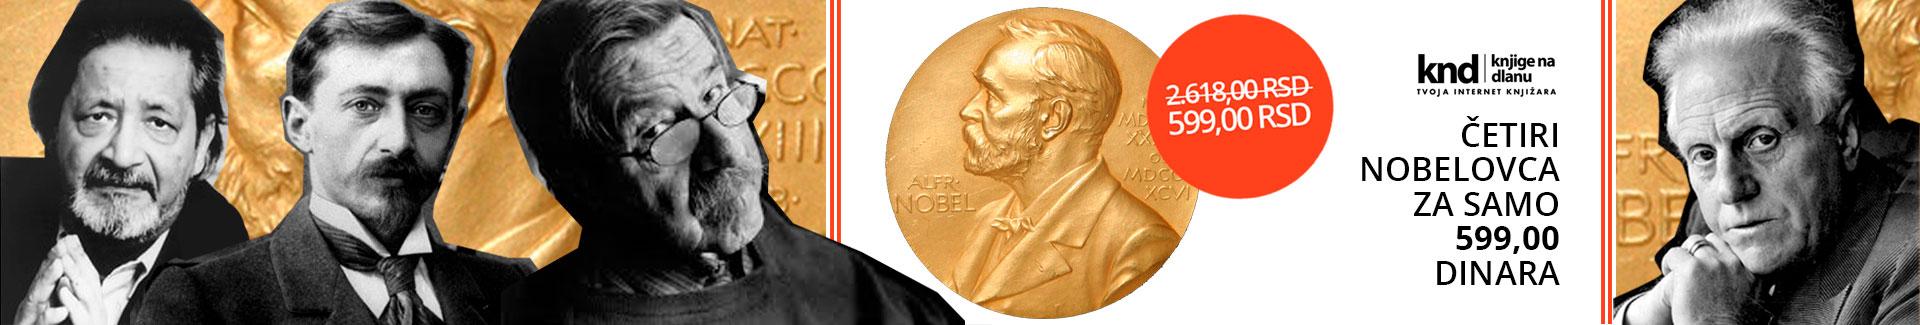 Nobelovci komplet